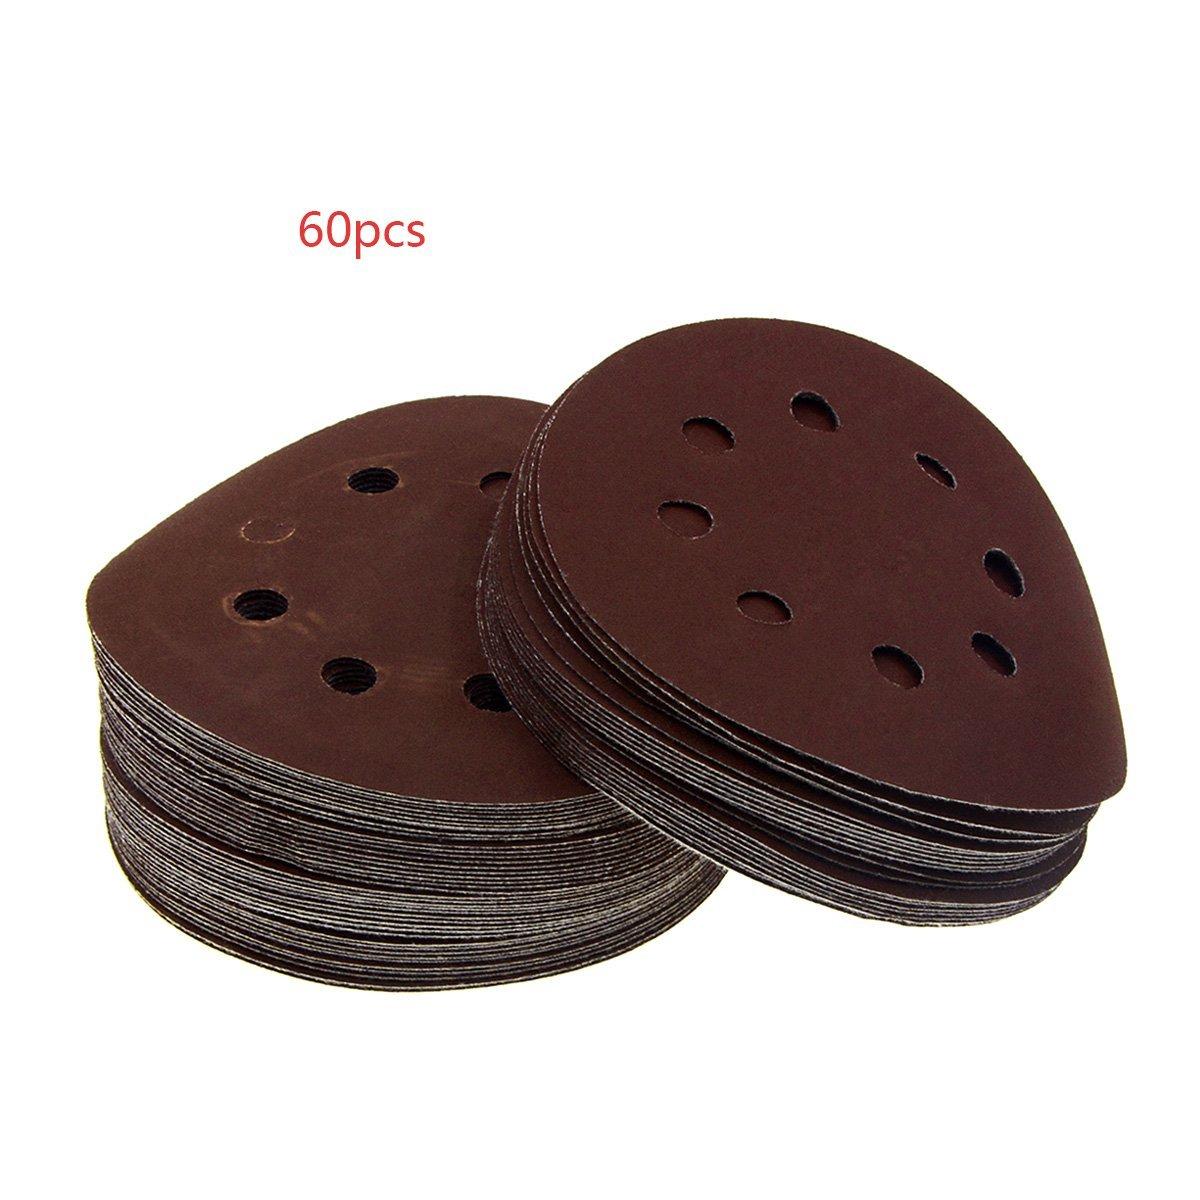 YXQ 5'' 8-Hole Hook and Loop Sanding Discs 5000Grit Sandpaper (24Pcs)